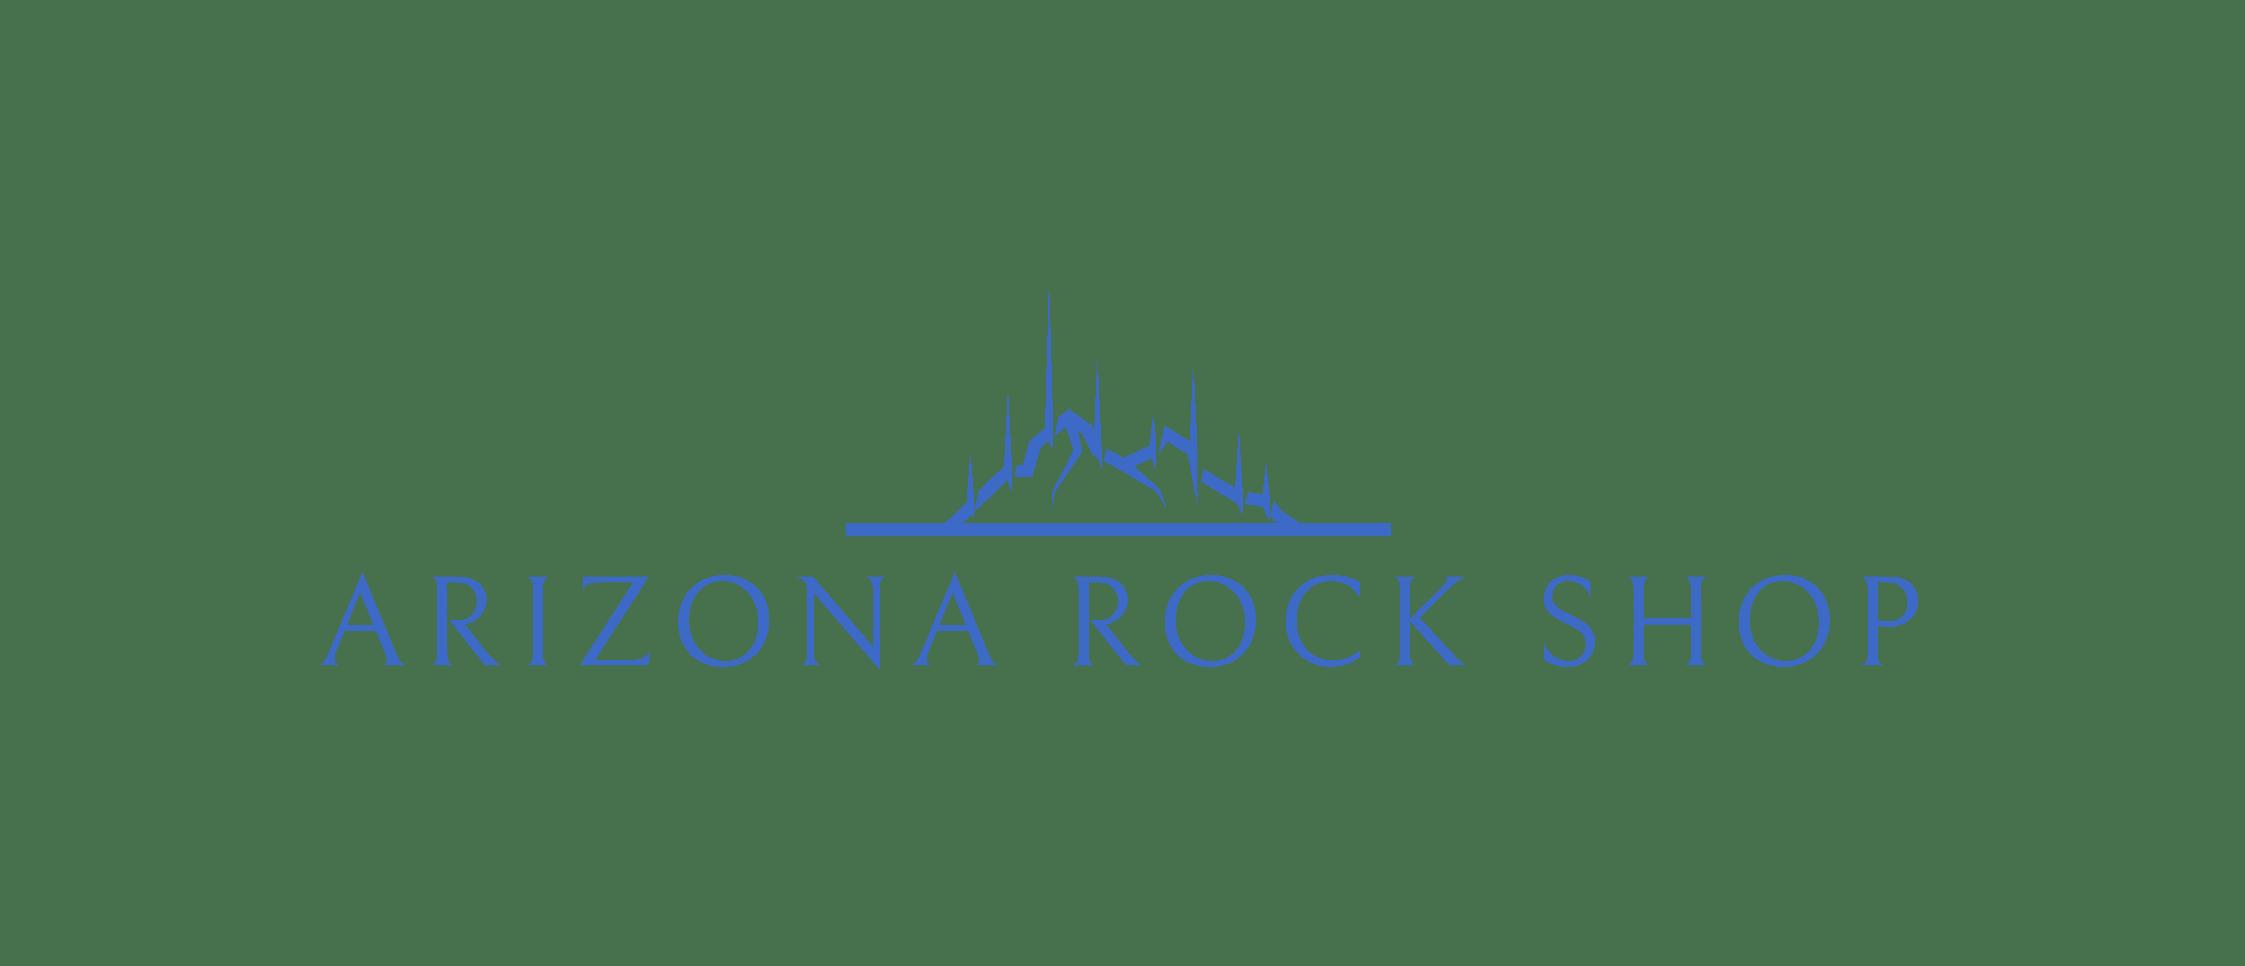 Arizona Rock Shop